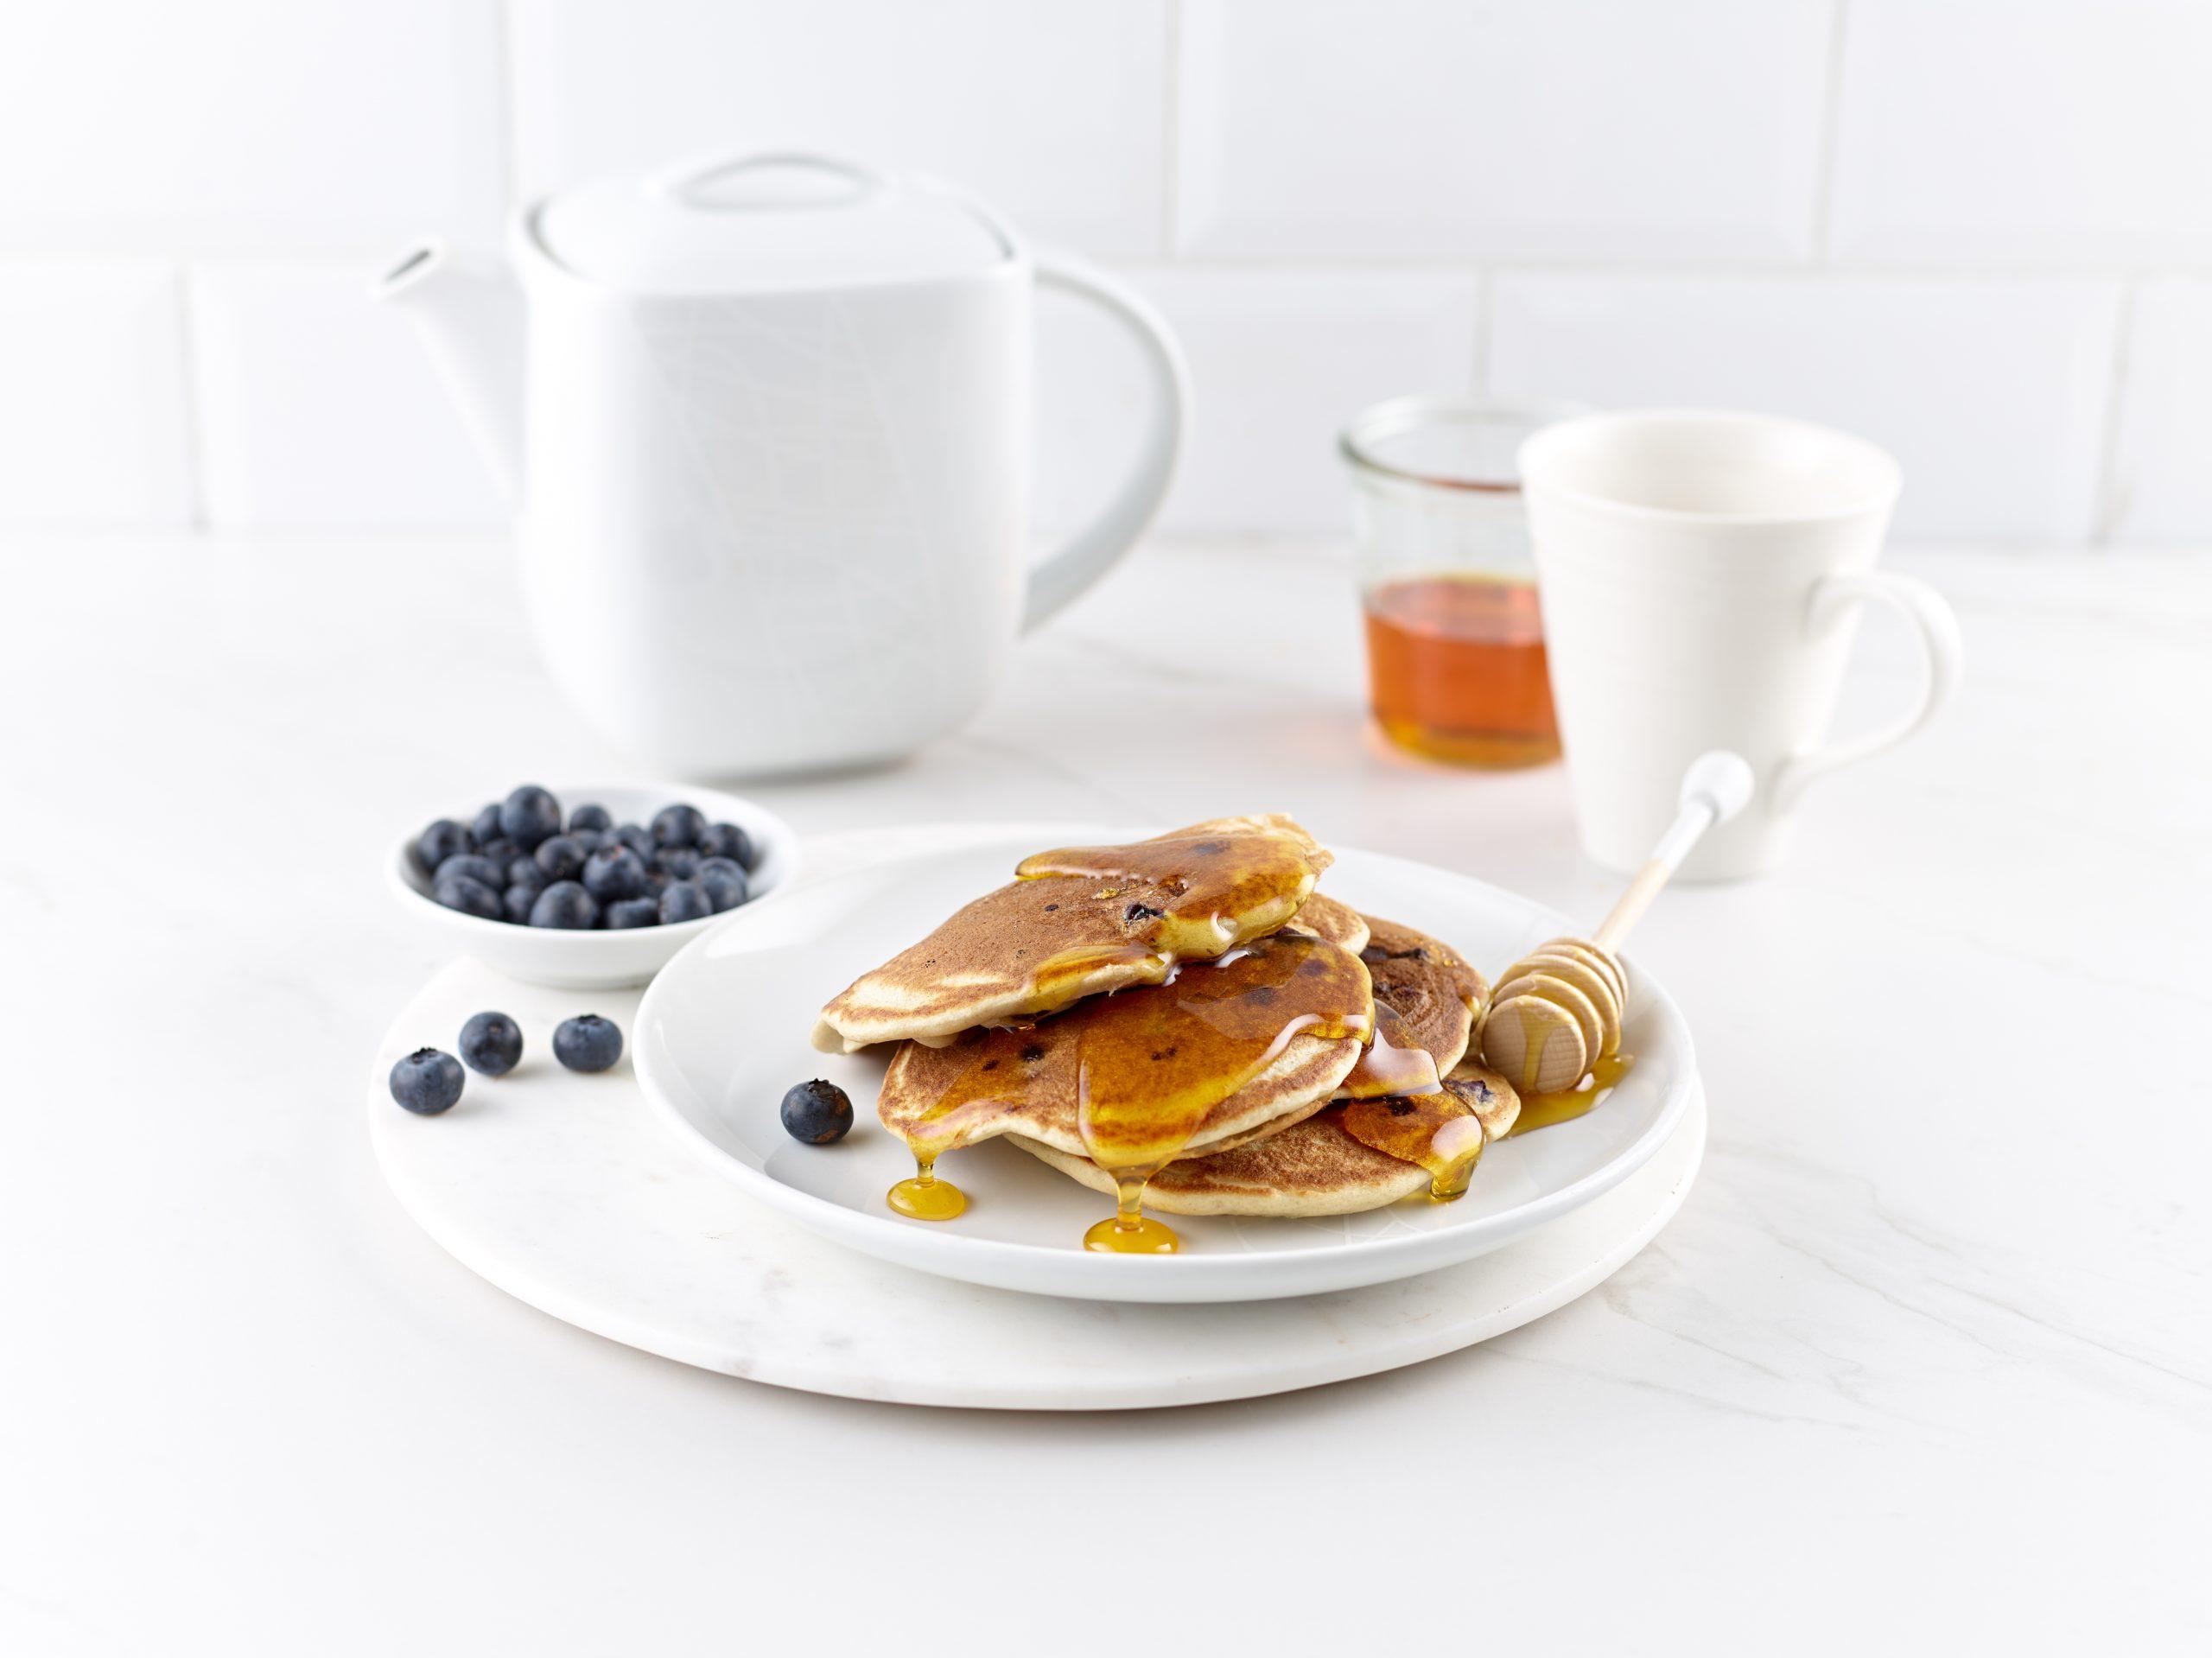 Gluten Free Buckwheat and Blueberry Breakfast Pancakes